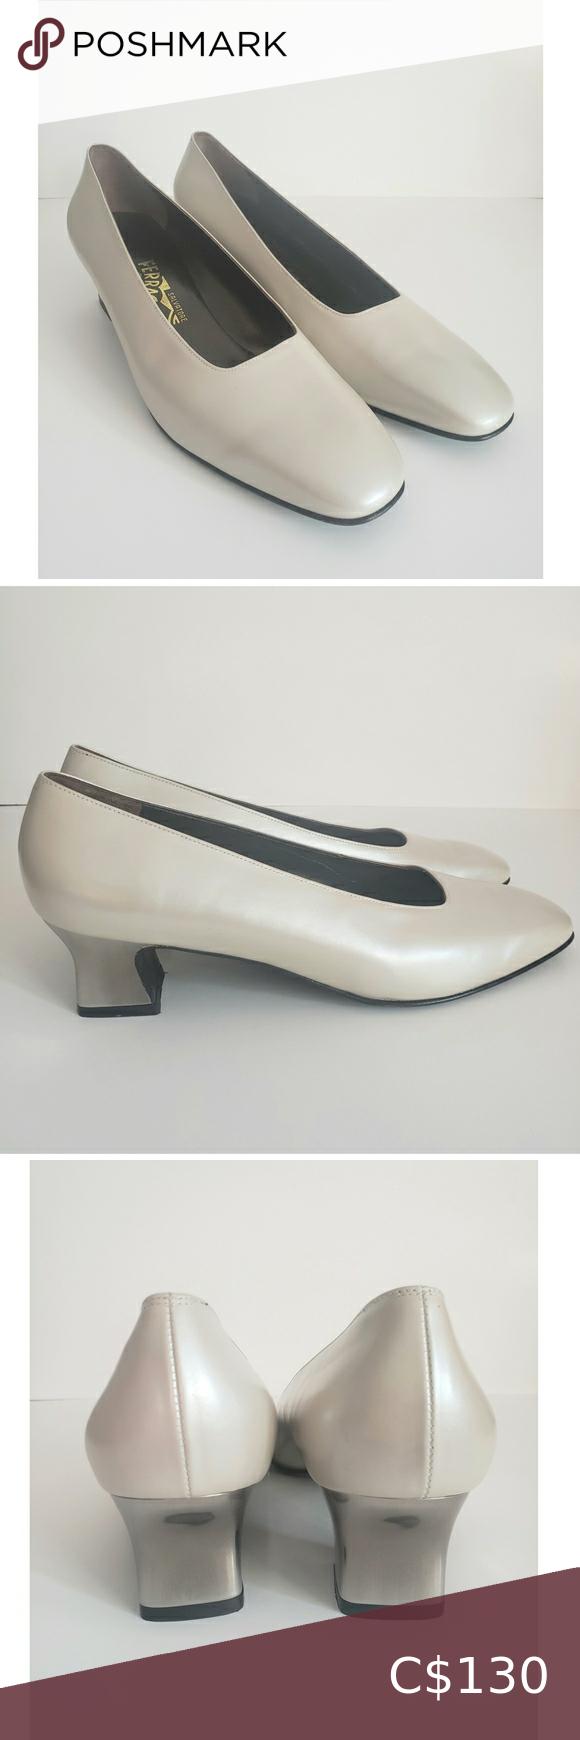 Salvatore Ferragamo Beige Leather Tassel Heels Pumps